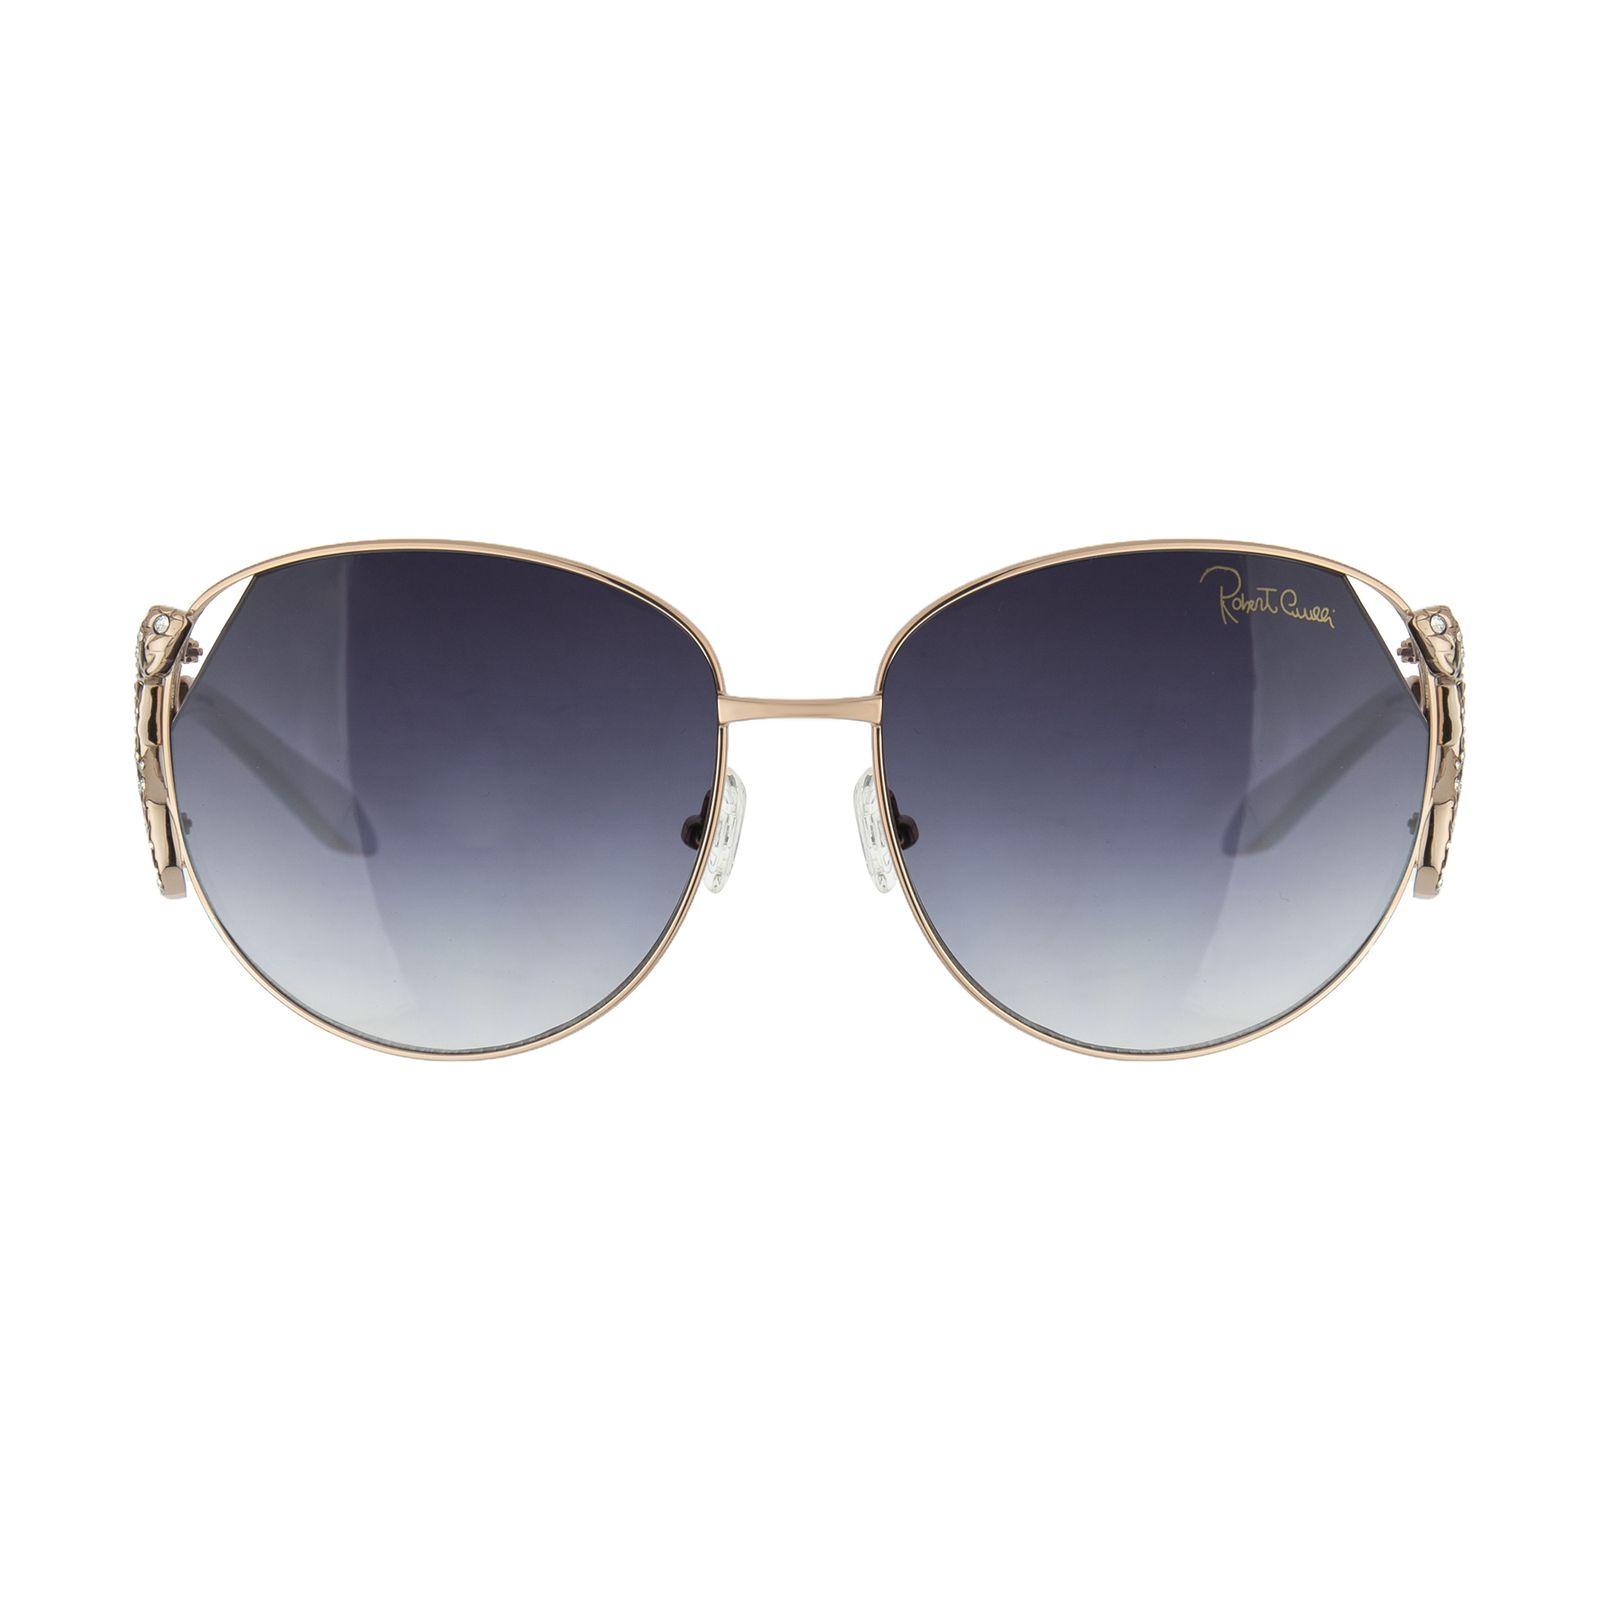 عینک آفتابی زنانه روبرتو کاوالی مدل 897 -  - 2